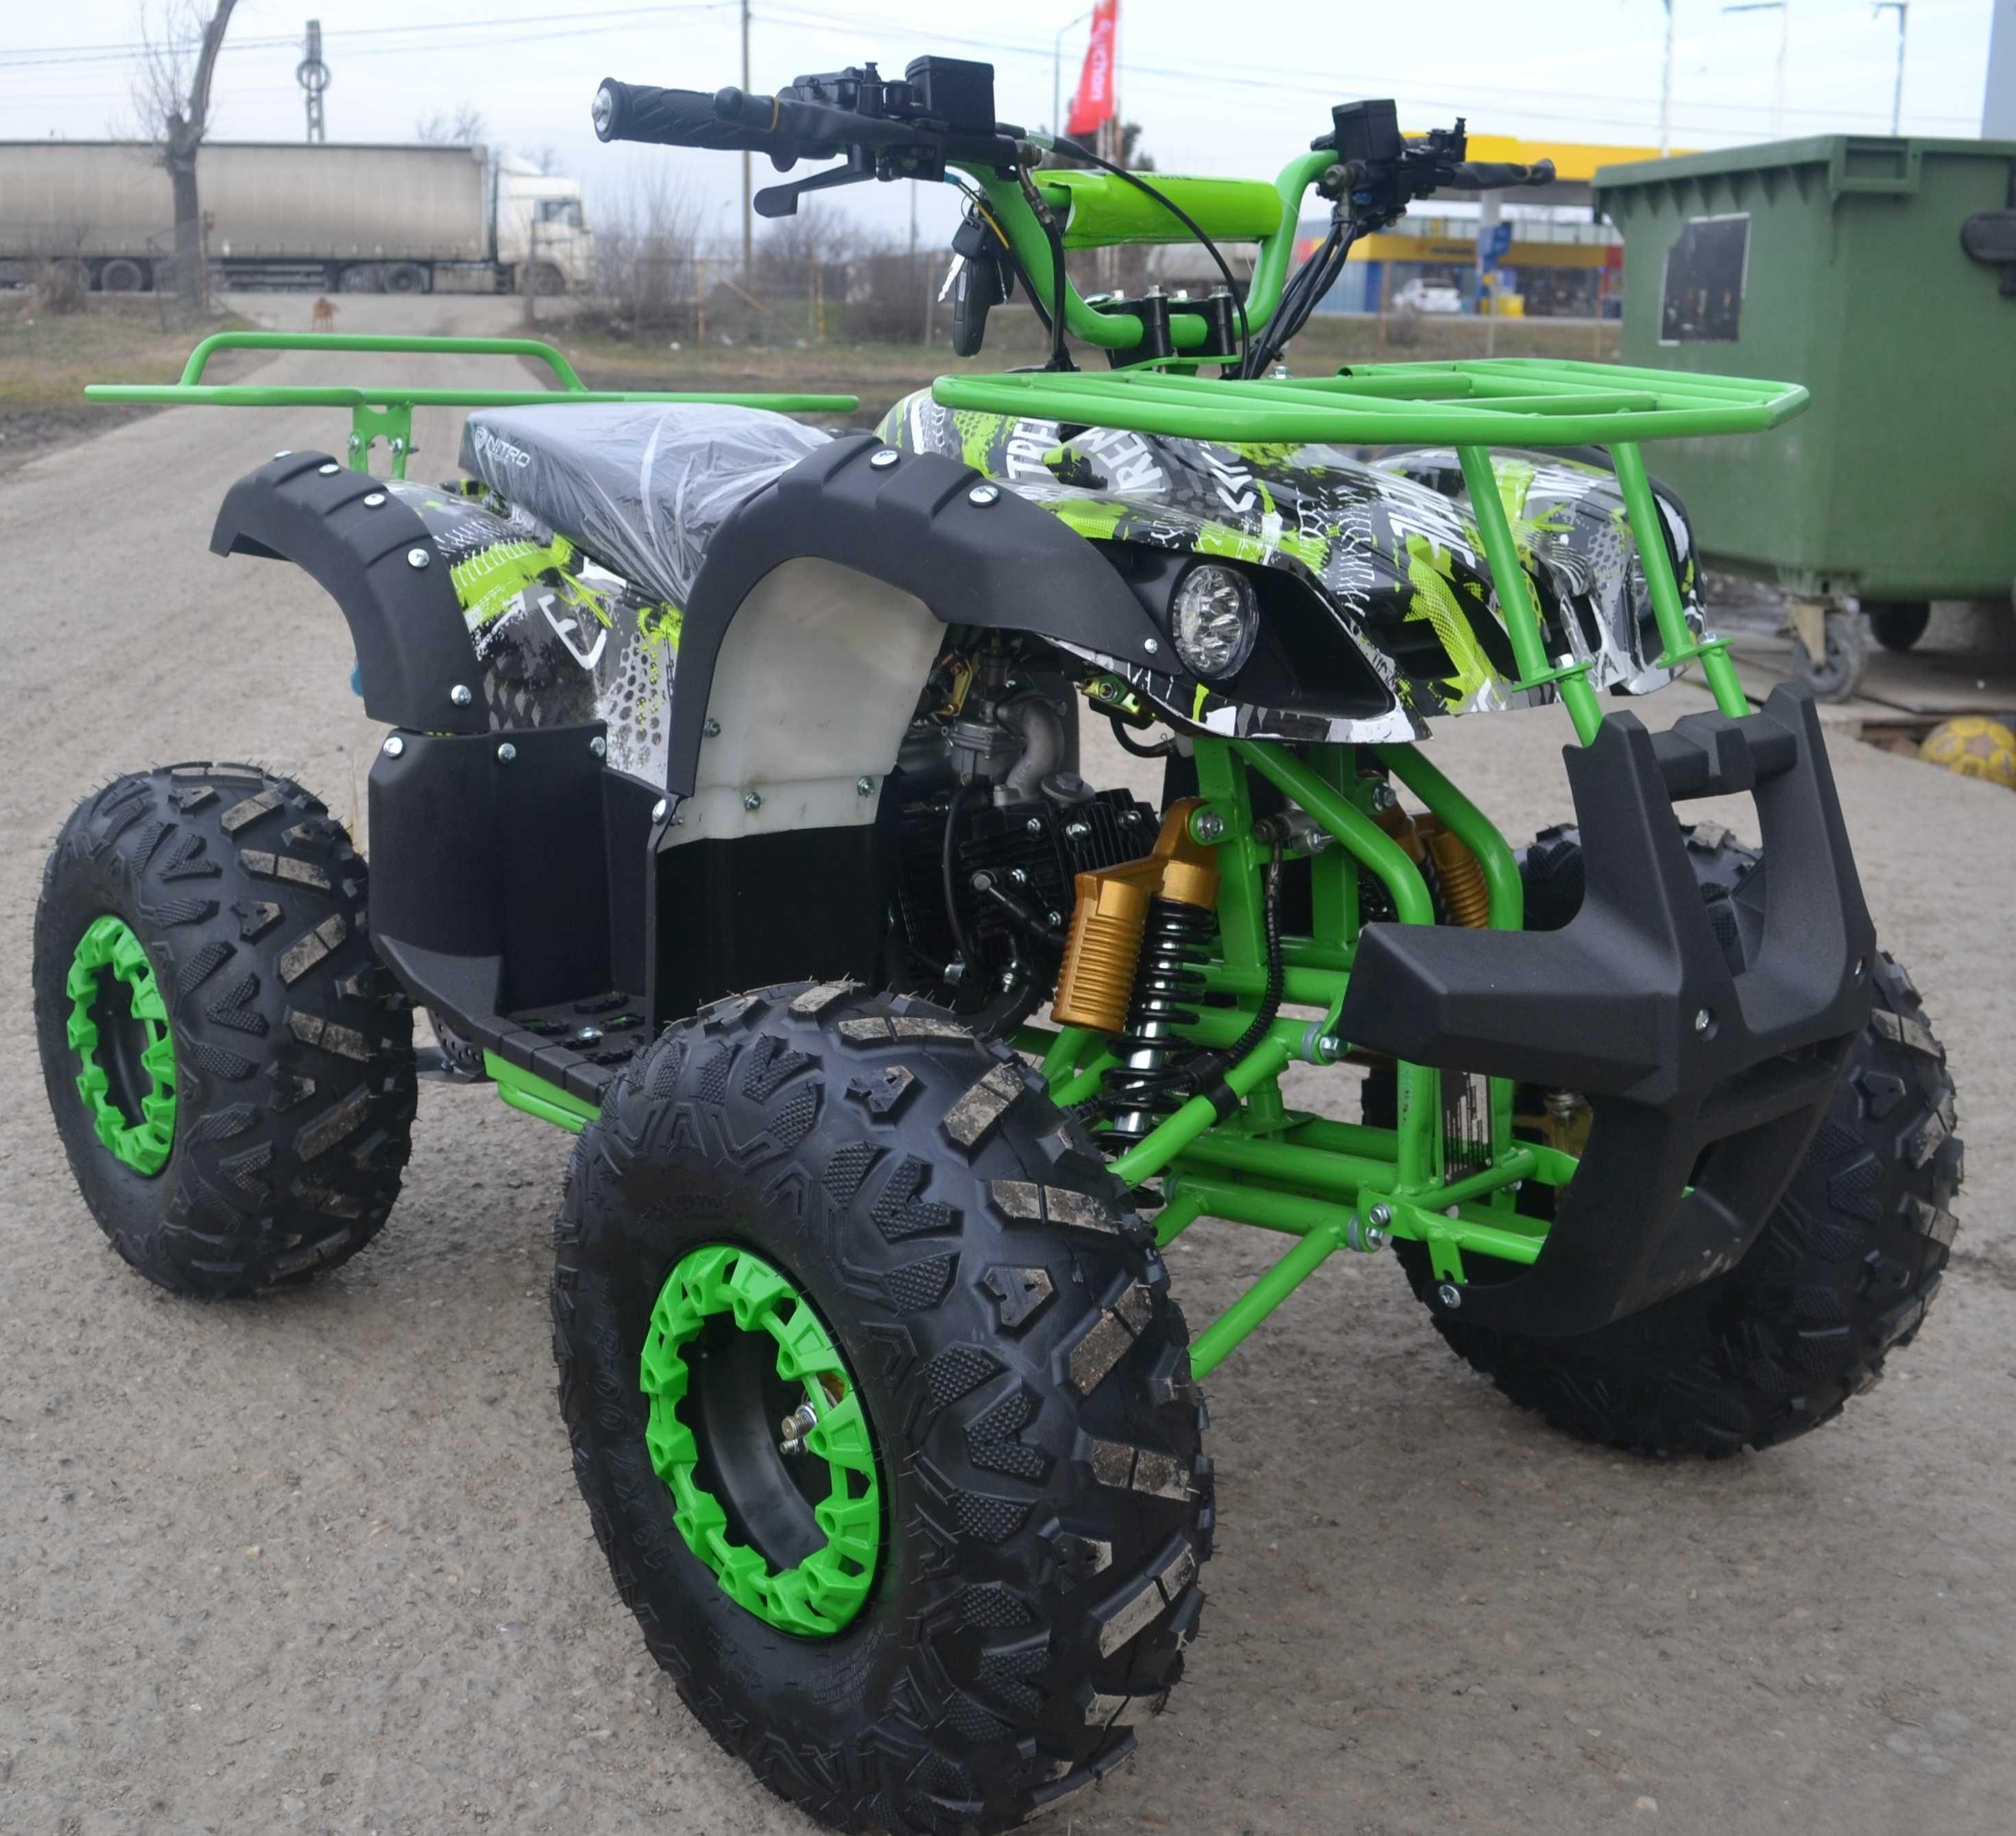 ATV 125cc NITRO TORONTO, Autoamtik NOU cu garantie, Import germania